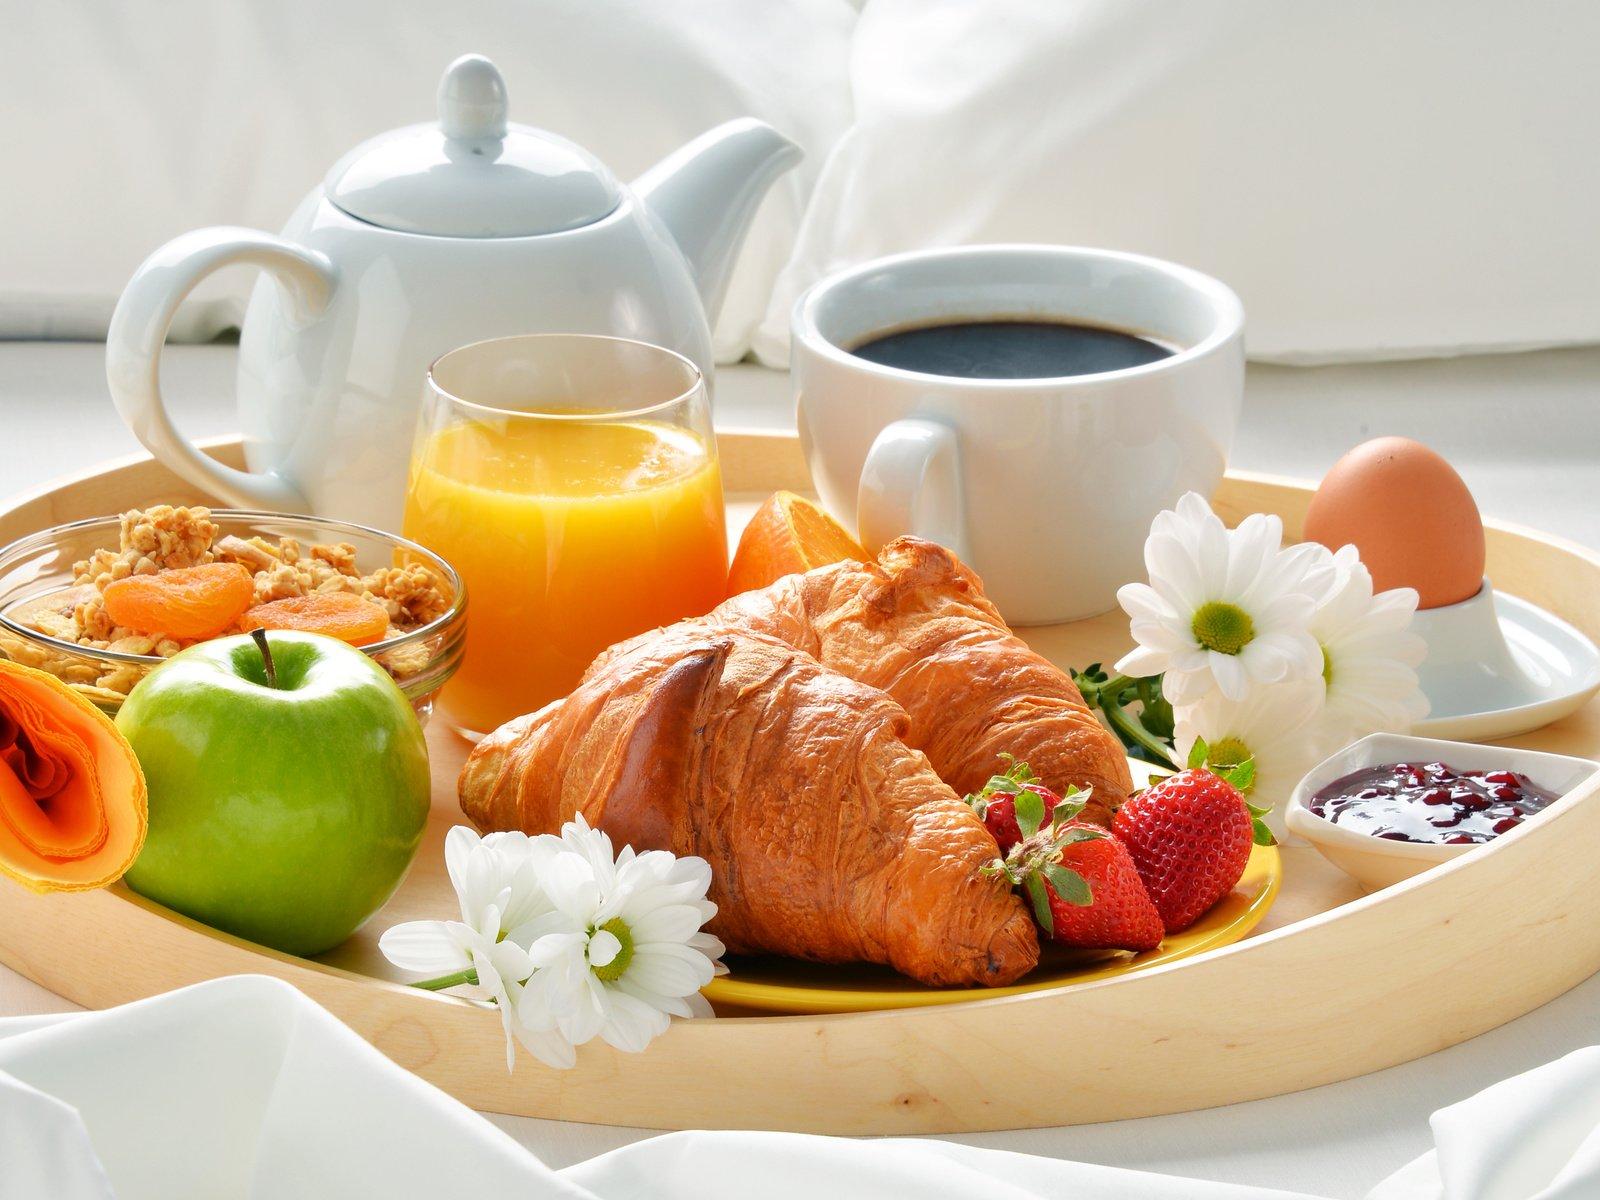 Картинки доброго утра и завтрак